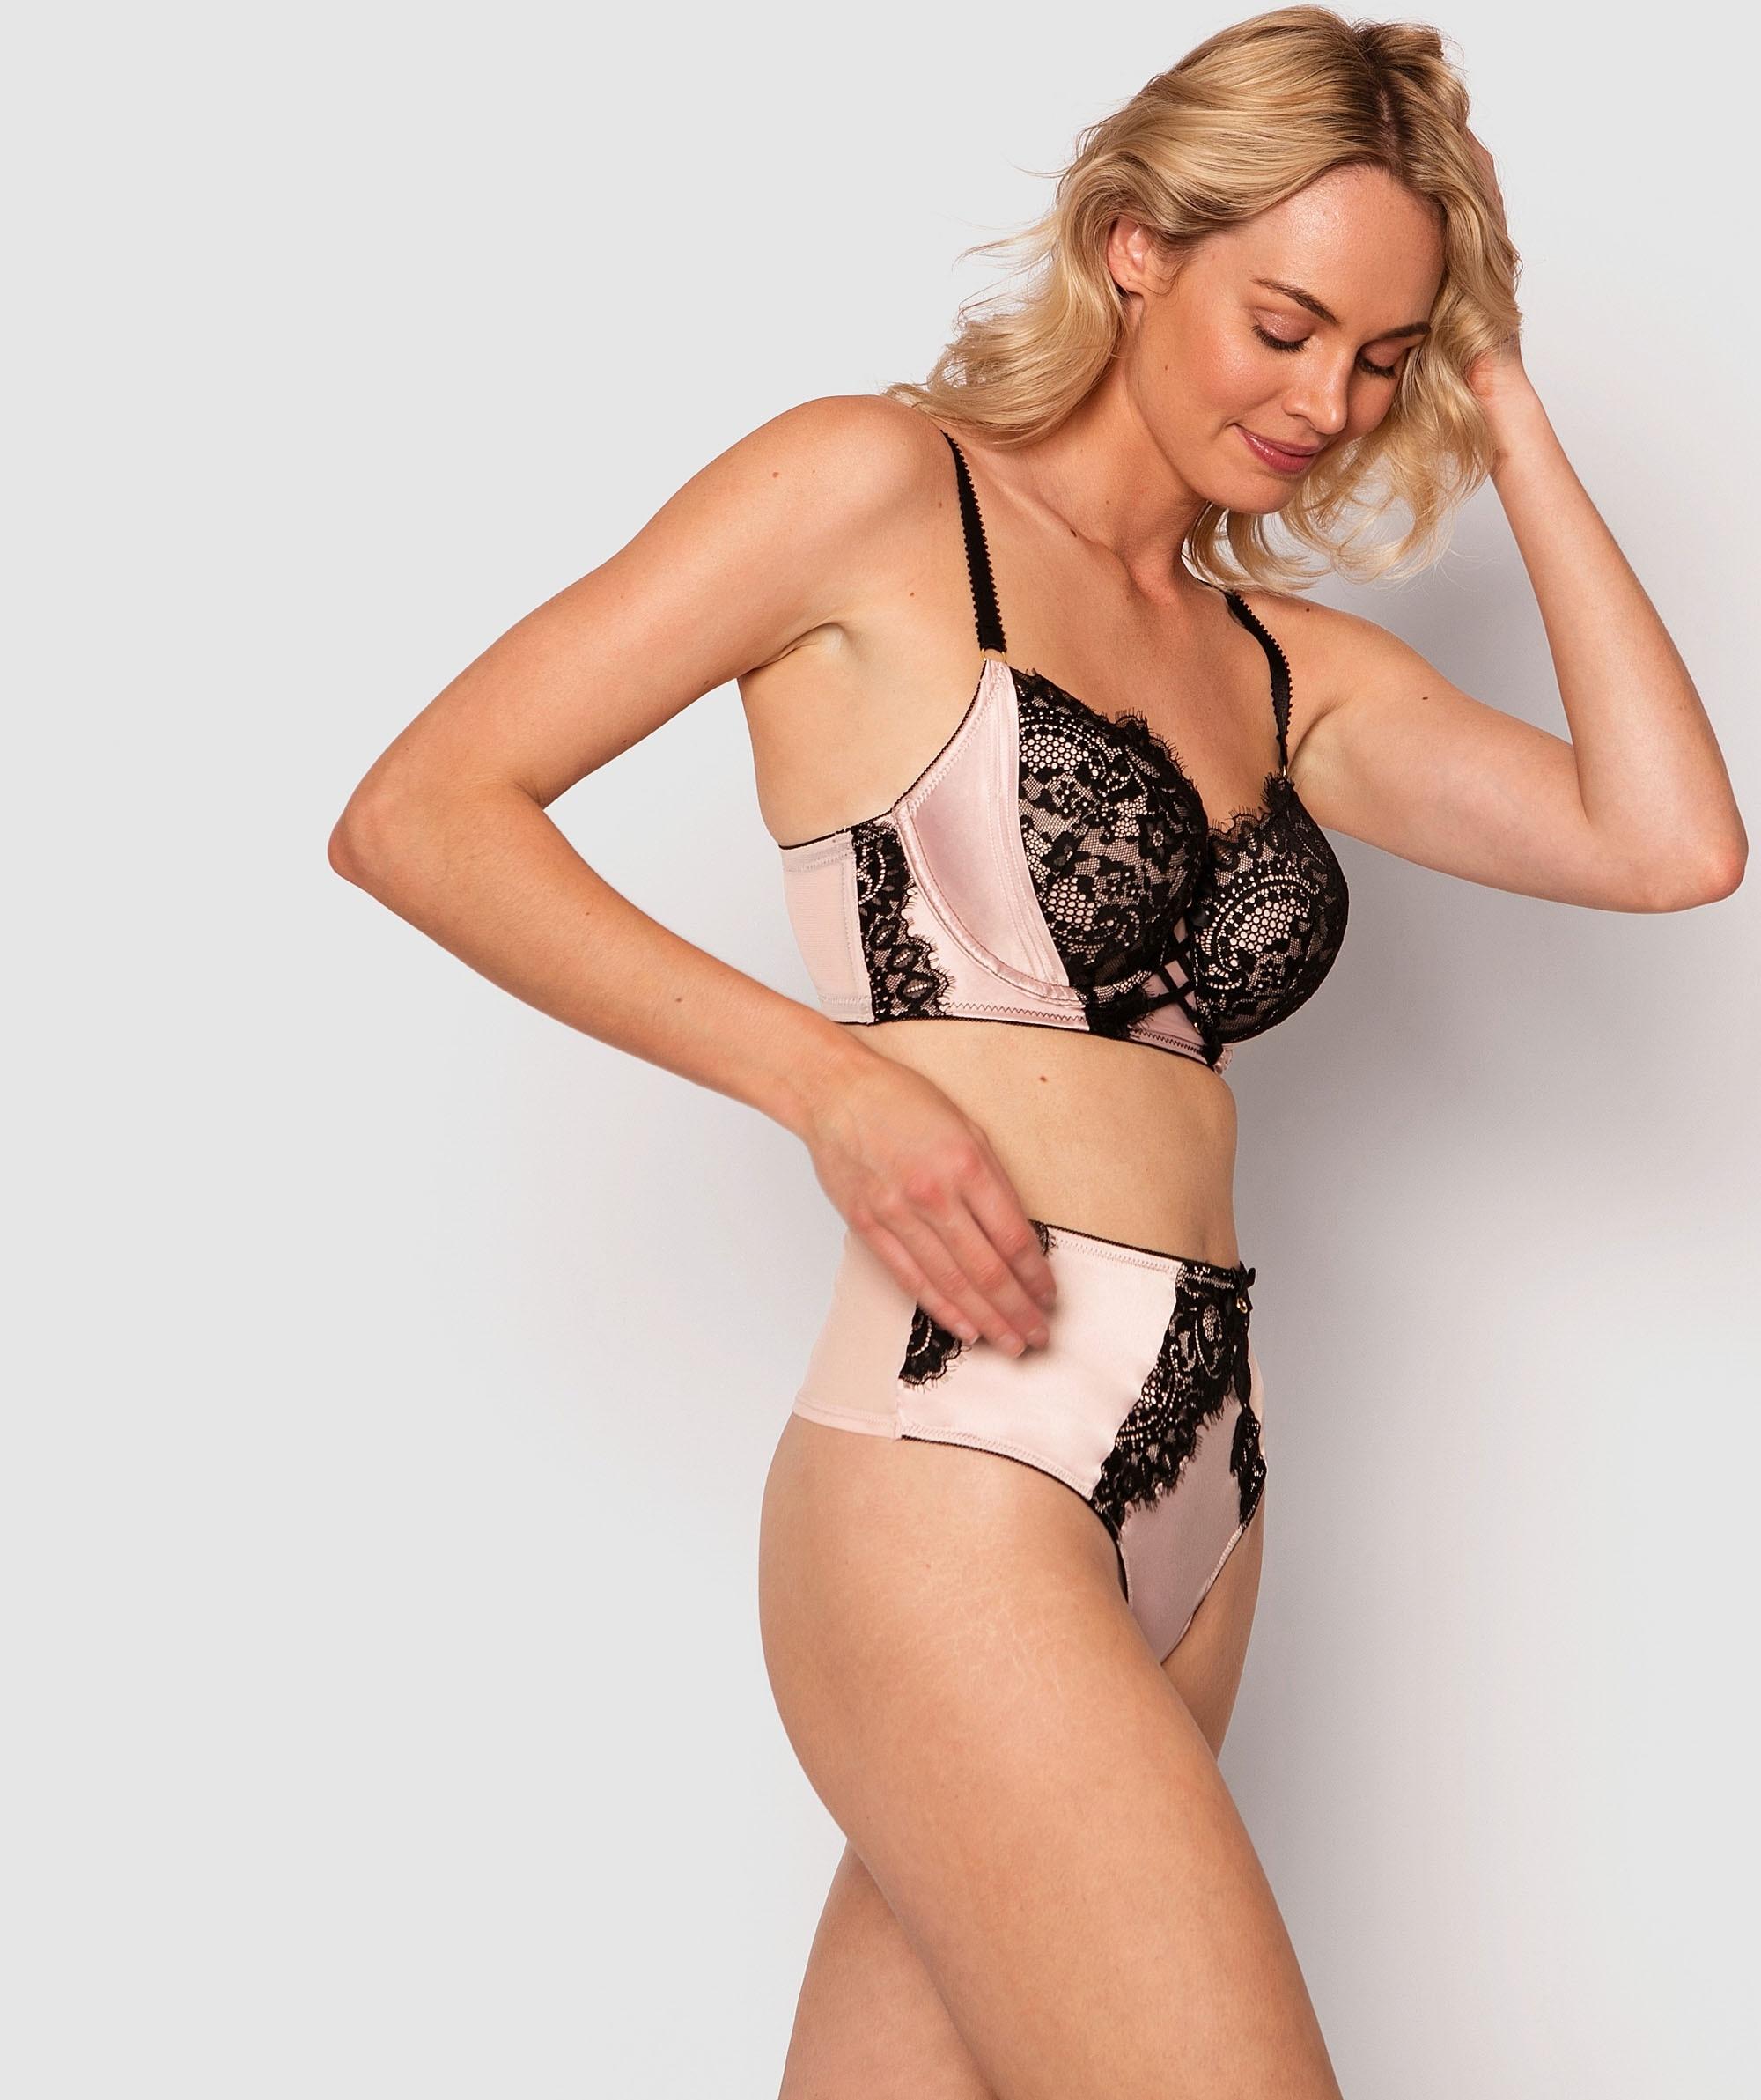 Victoria High Waist V String Knicker - Light Pink/Black